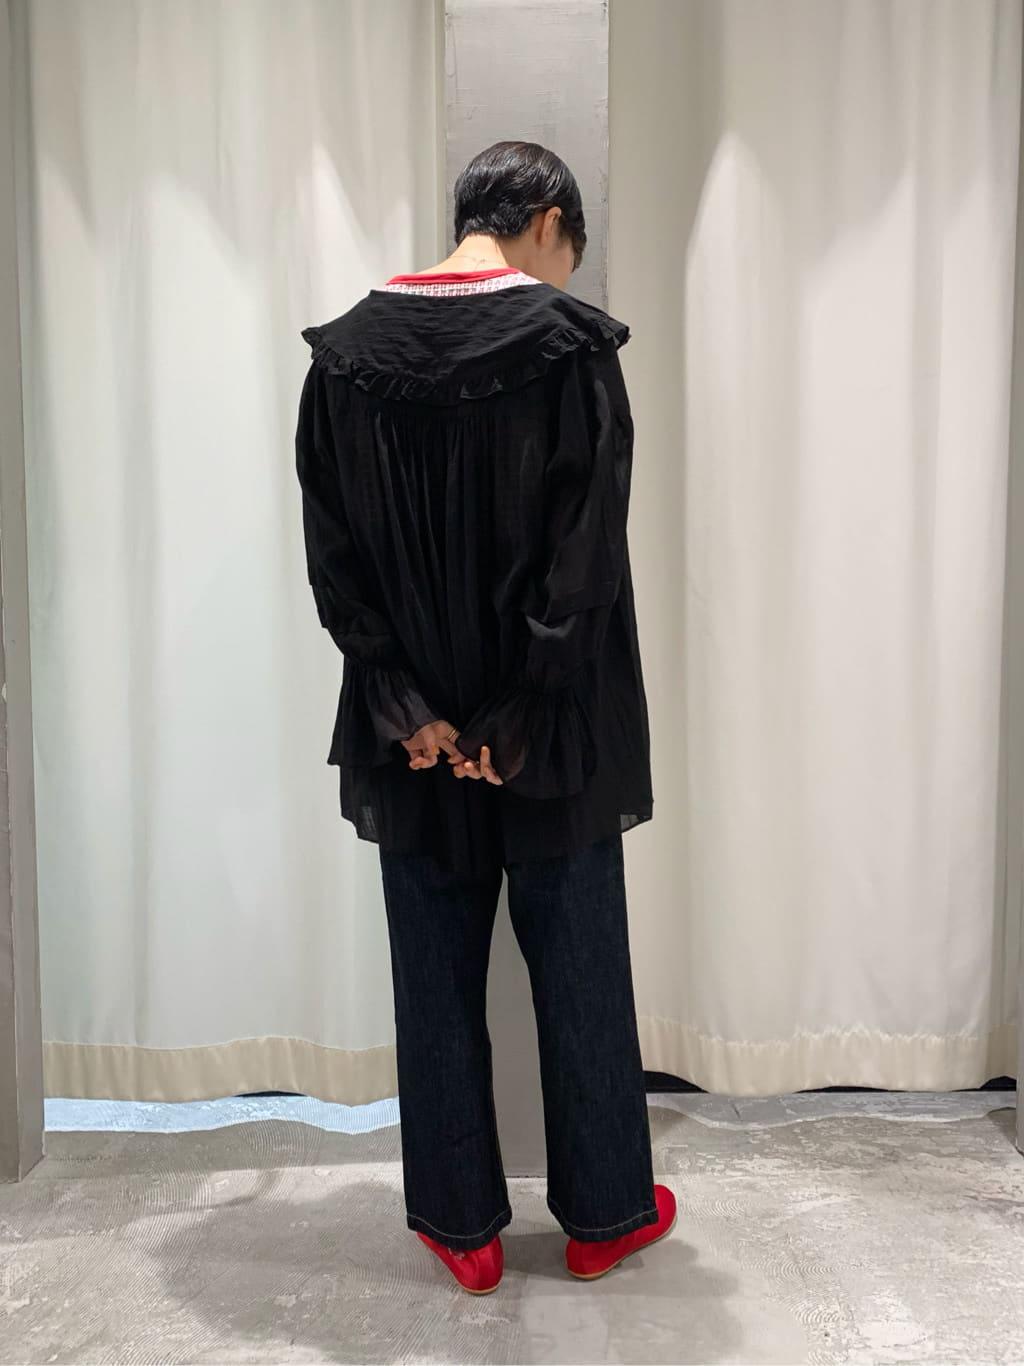 - CHILD WOMAN CHILD WOMAN , PAR ICI ルミネ横浜 身長:158cm 2021.08.13